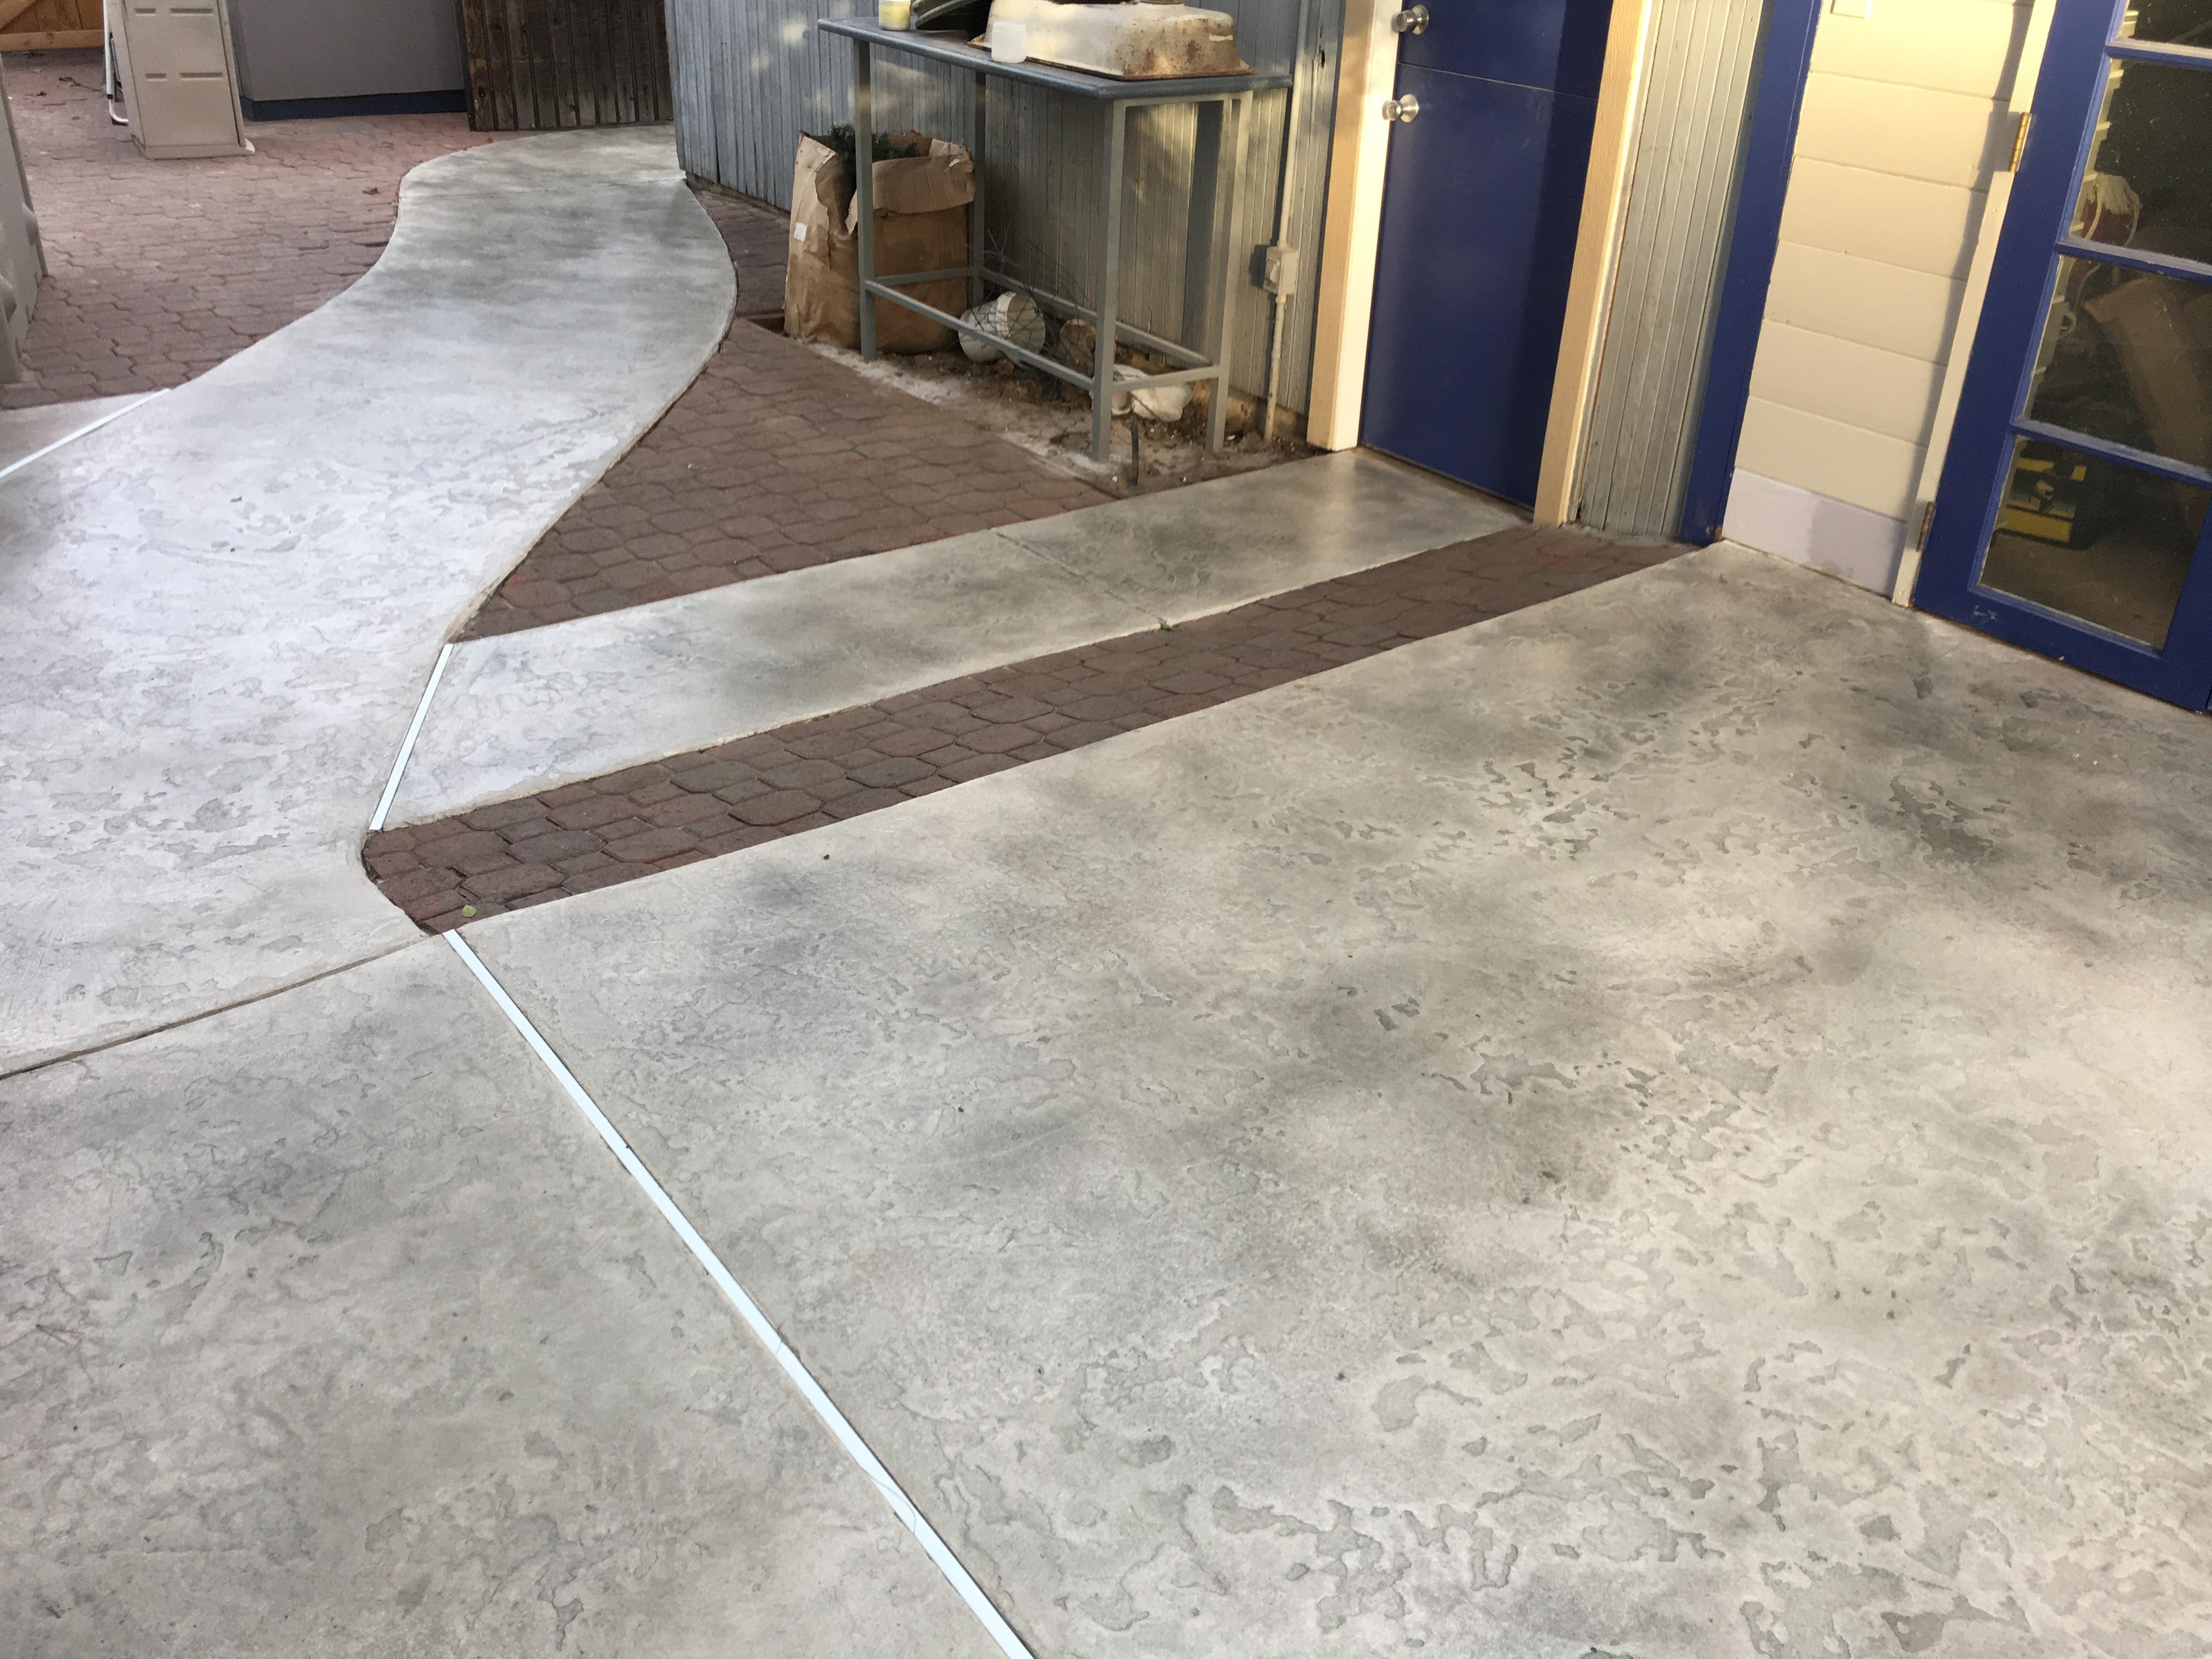 Concrete Coatings Cement Stain Kool Deck 16 Arrowhead Deck And Pools Llc Arrowhead Deck And Concrete Llc